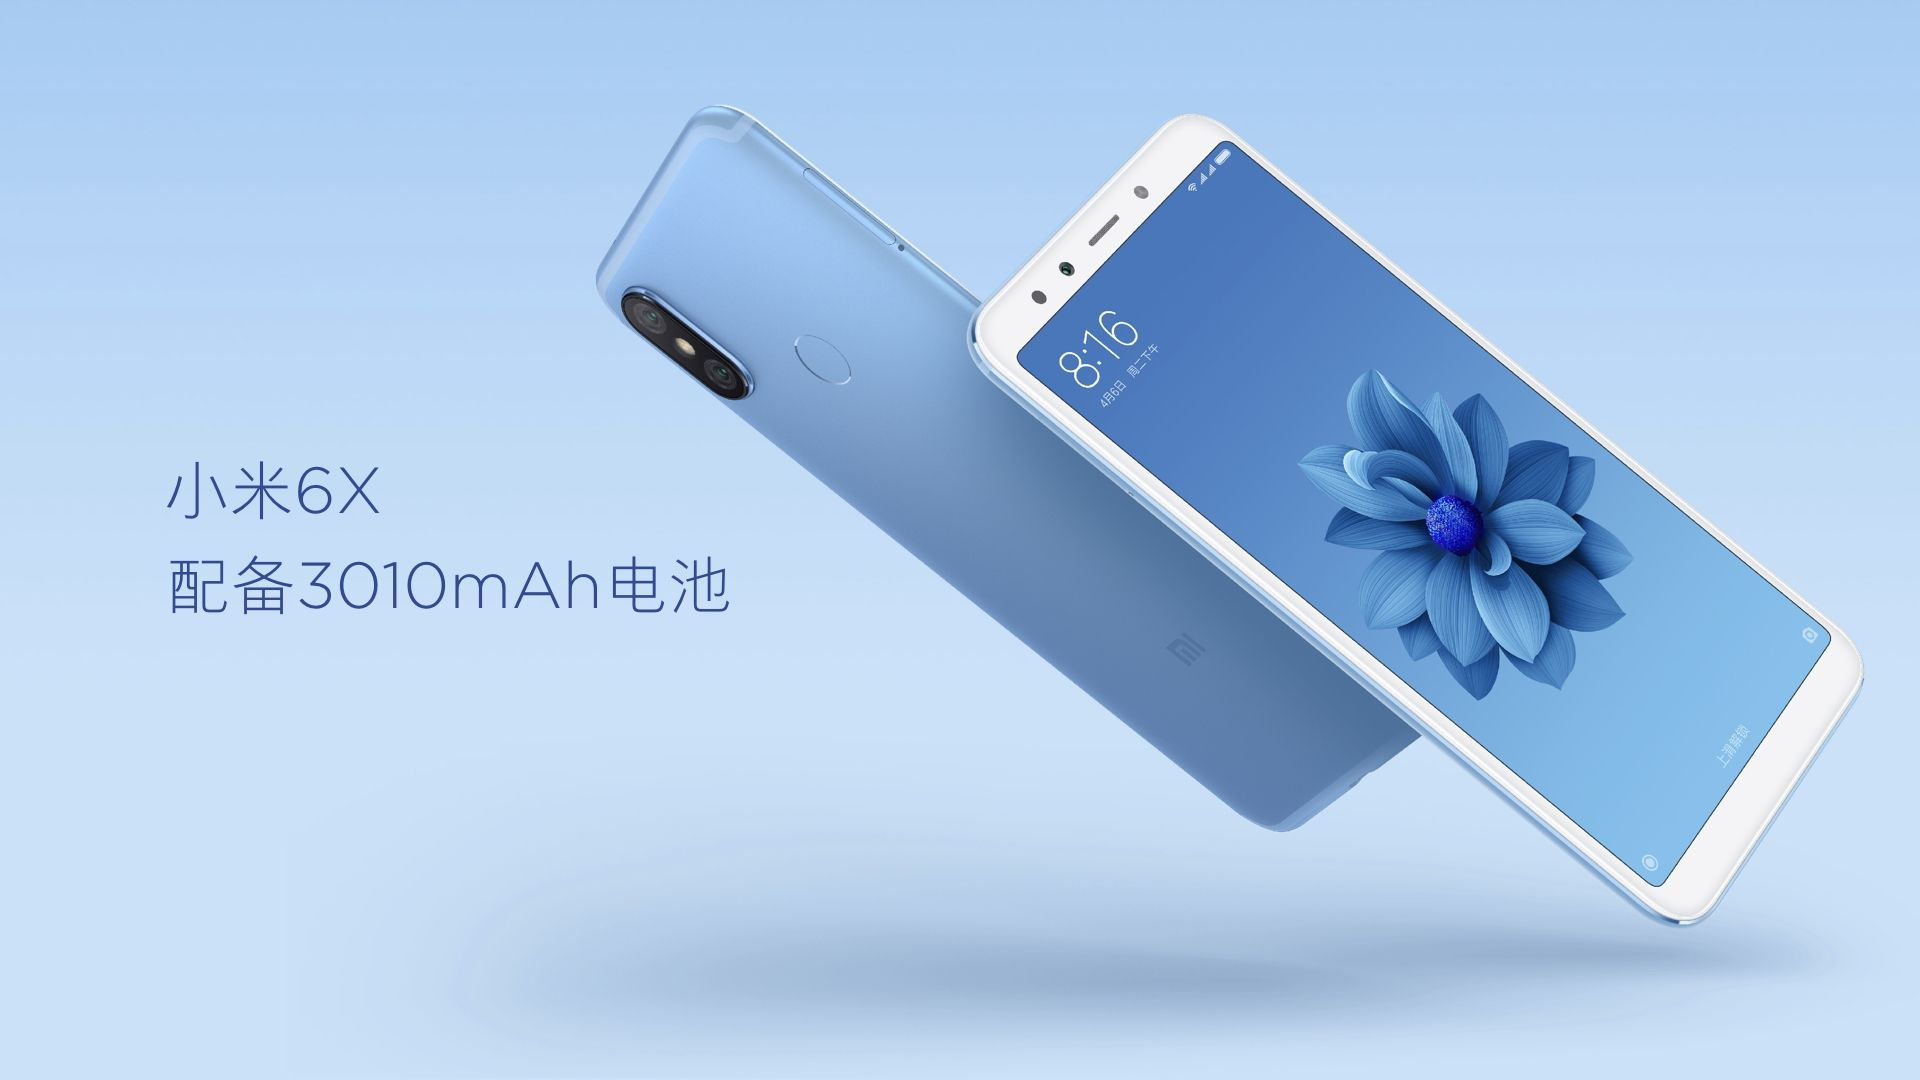 XiaomI Mi 6X Battery